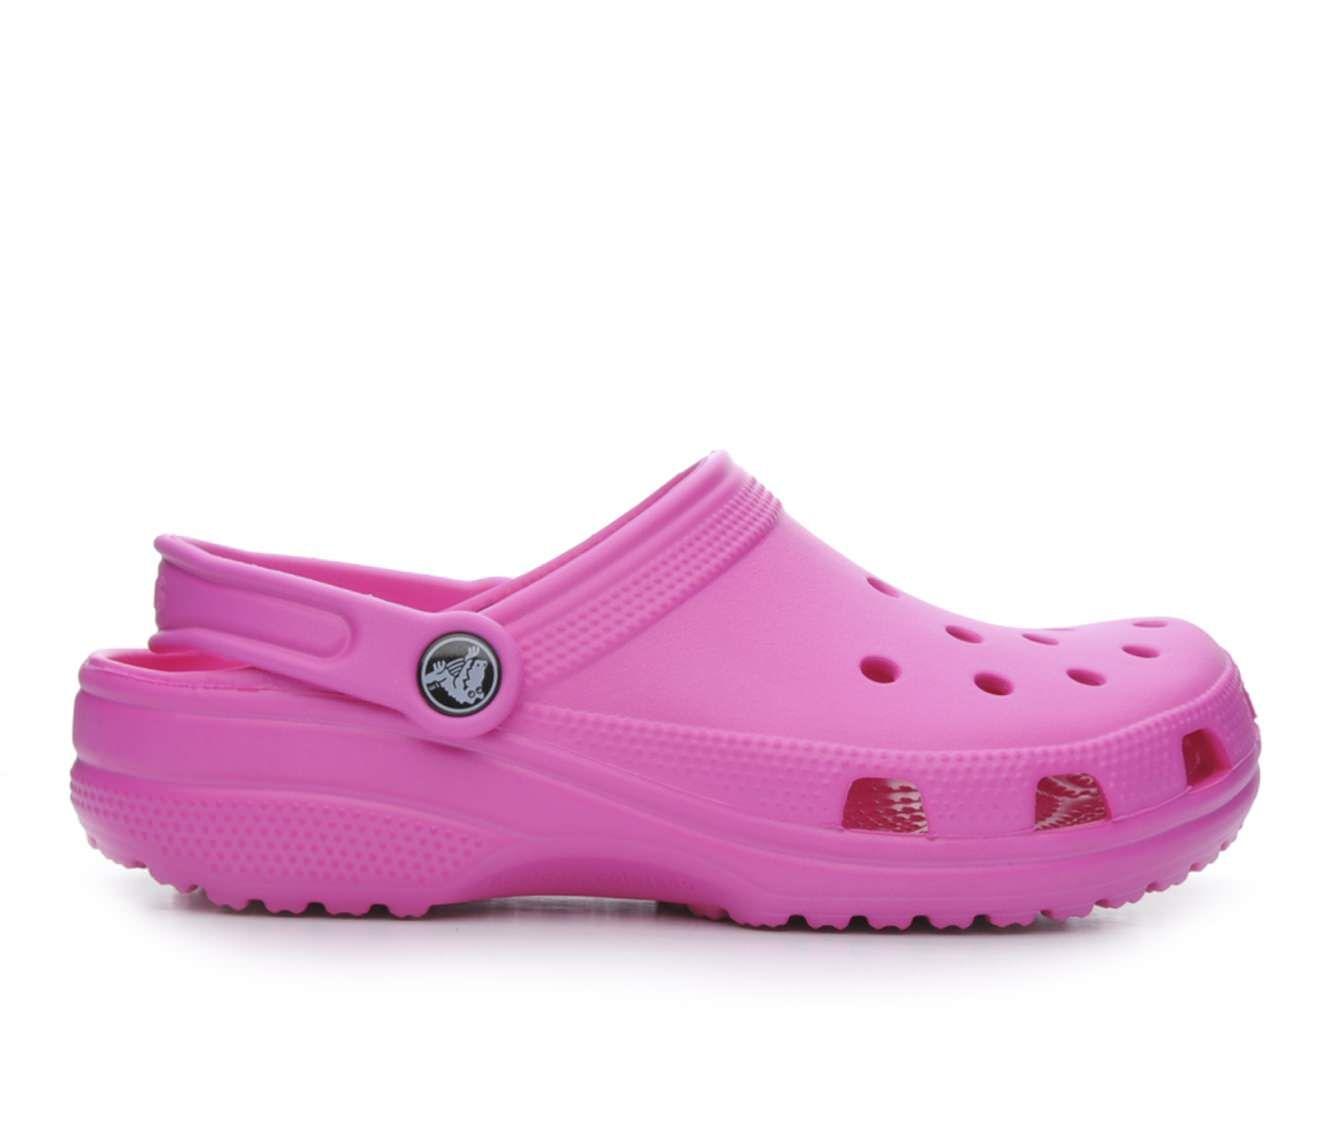 Women's Crocs Classic Clogs Neon Magenta